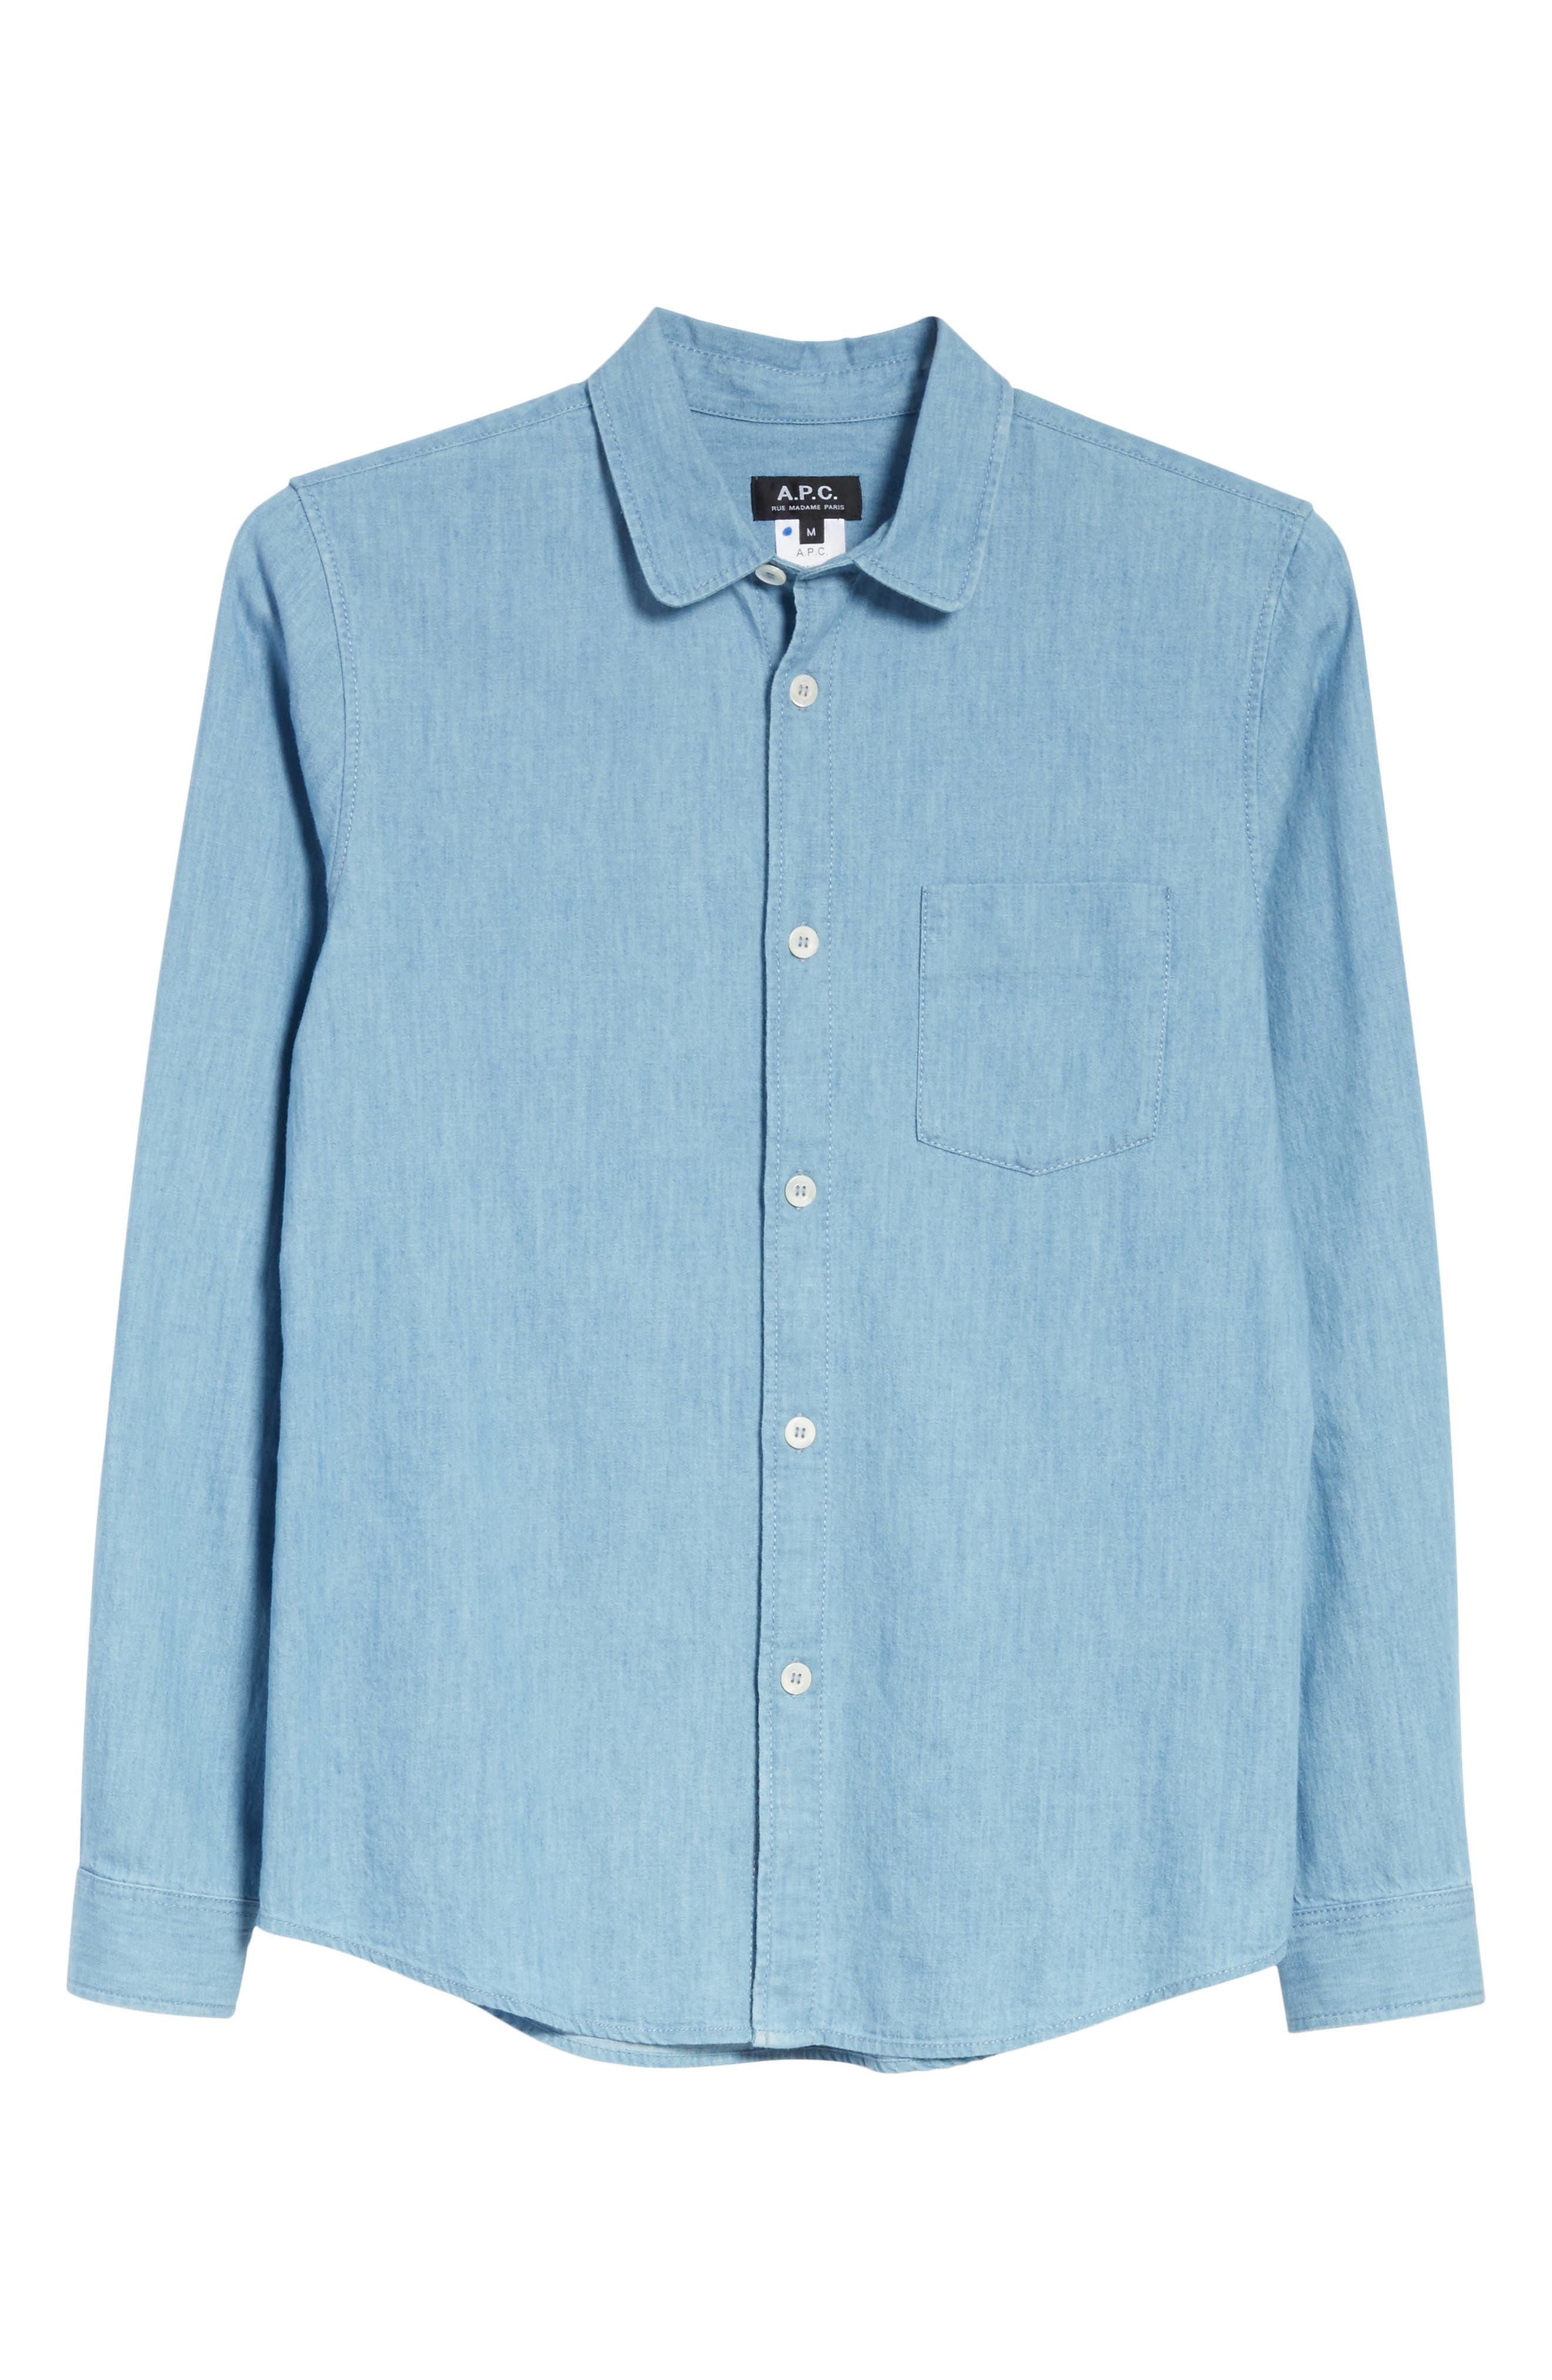 Chambray Shirt,                             Alternate thumbnail 6, color,                             Bleu Iaa